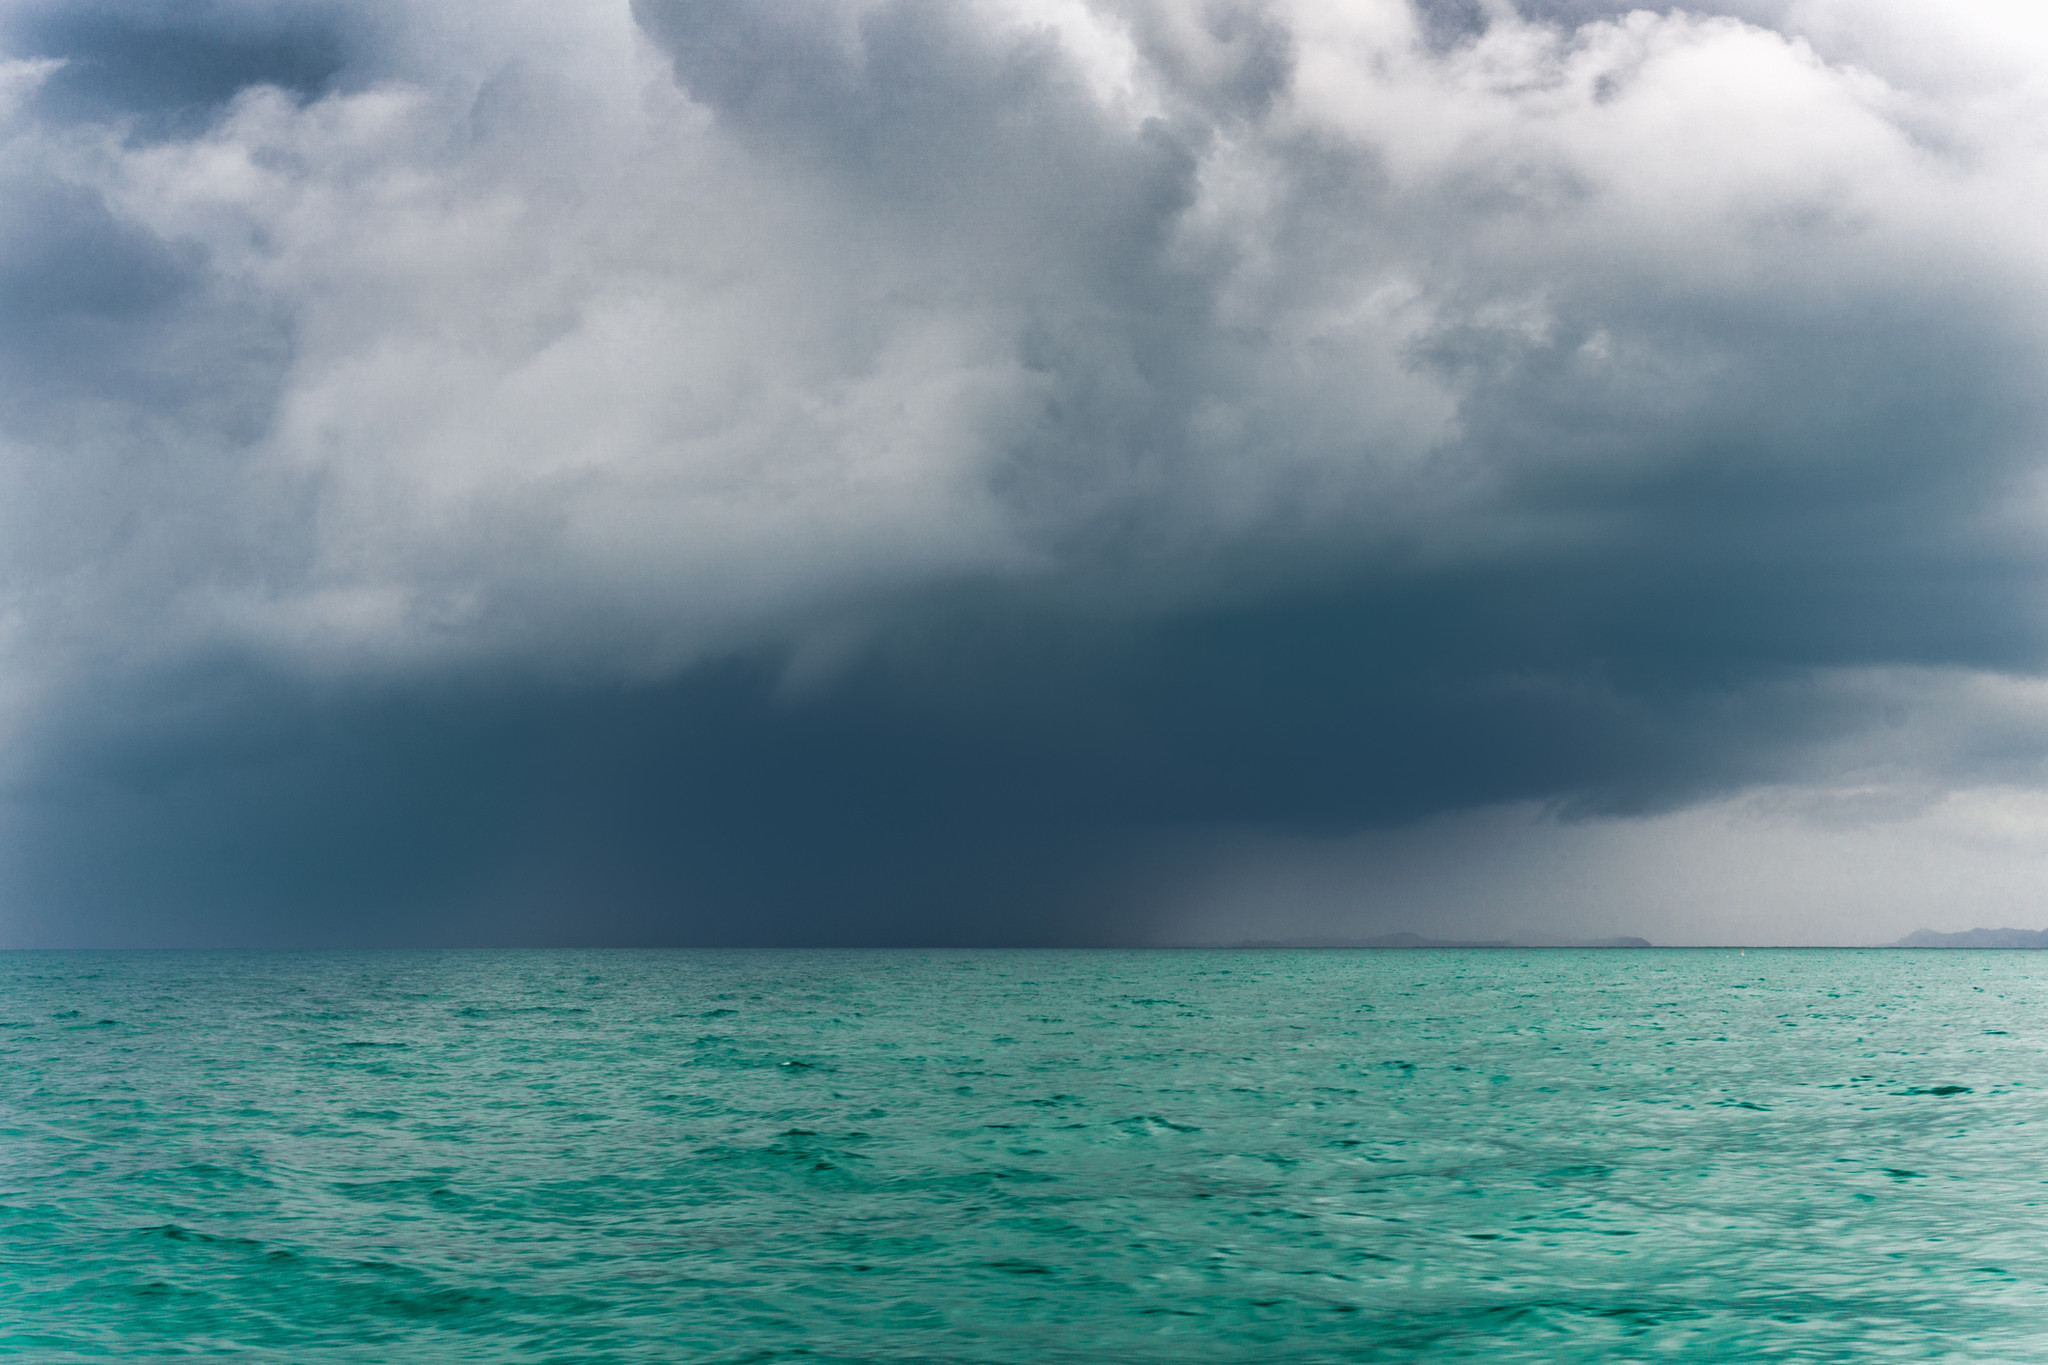 Louisiana man drowns while proposing to girlfriend underwater in Tanzania